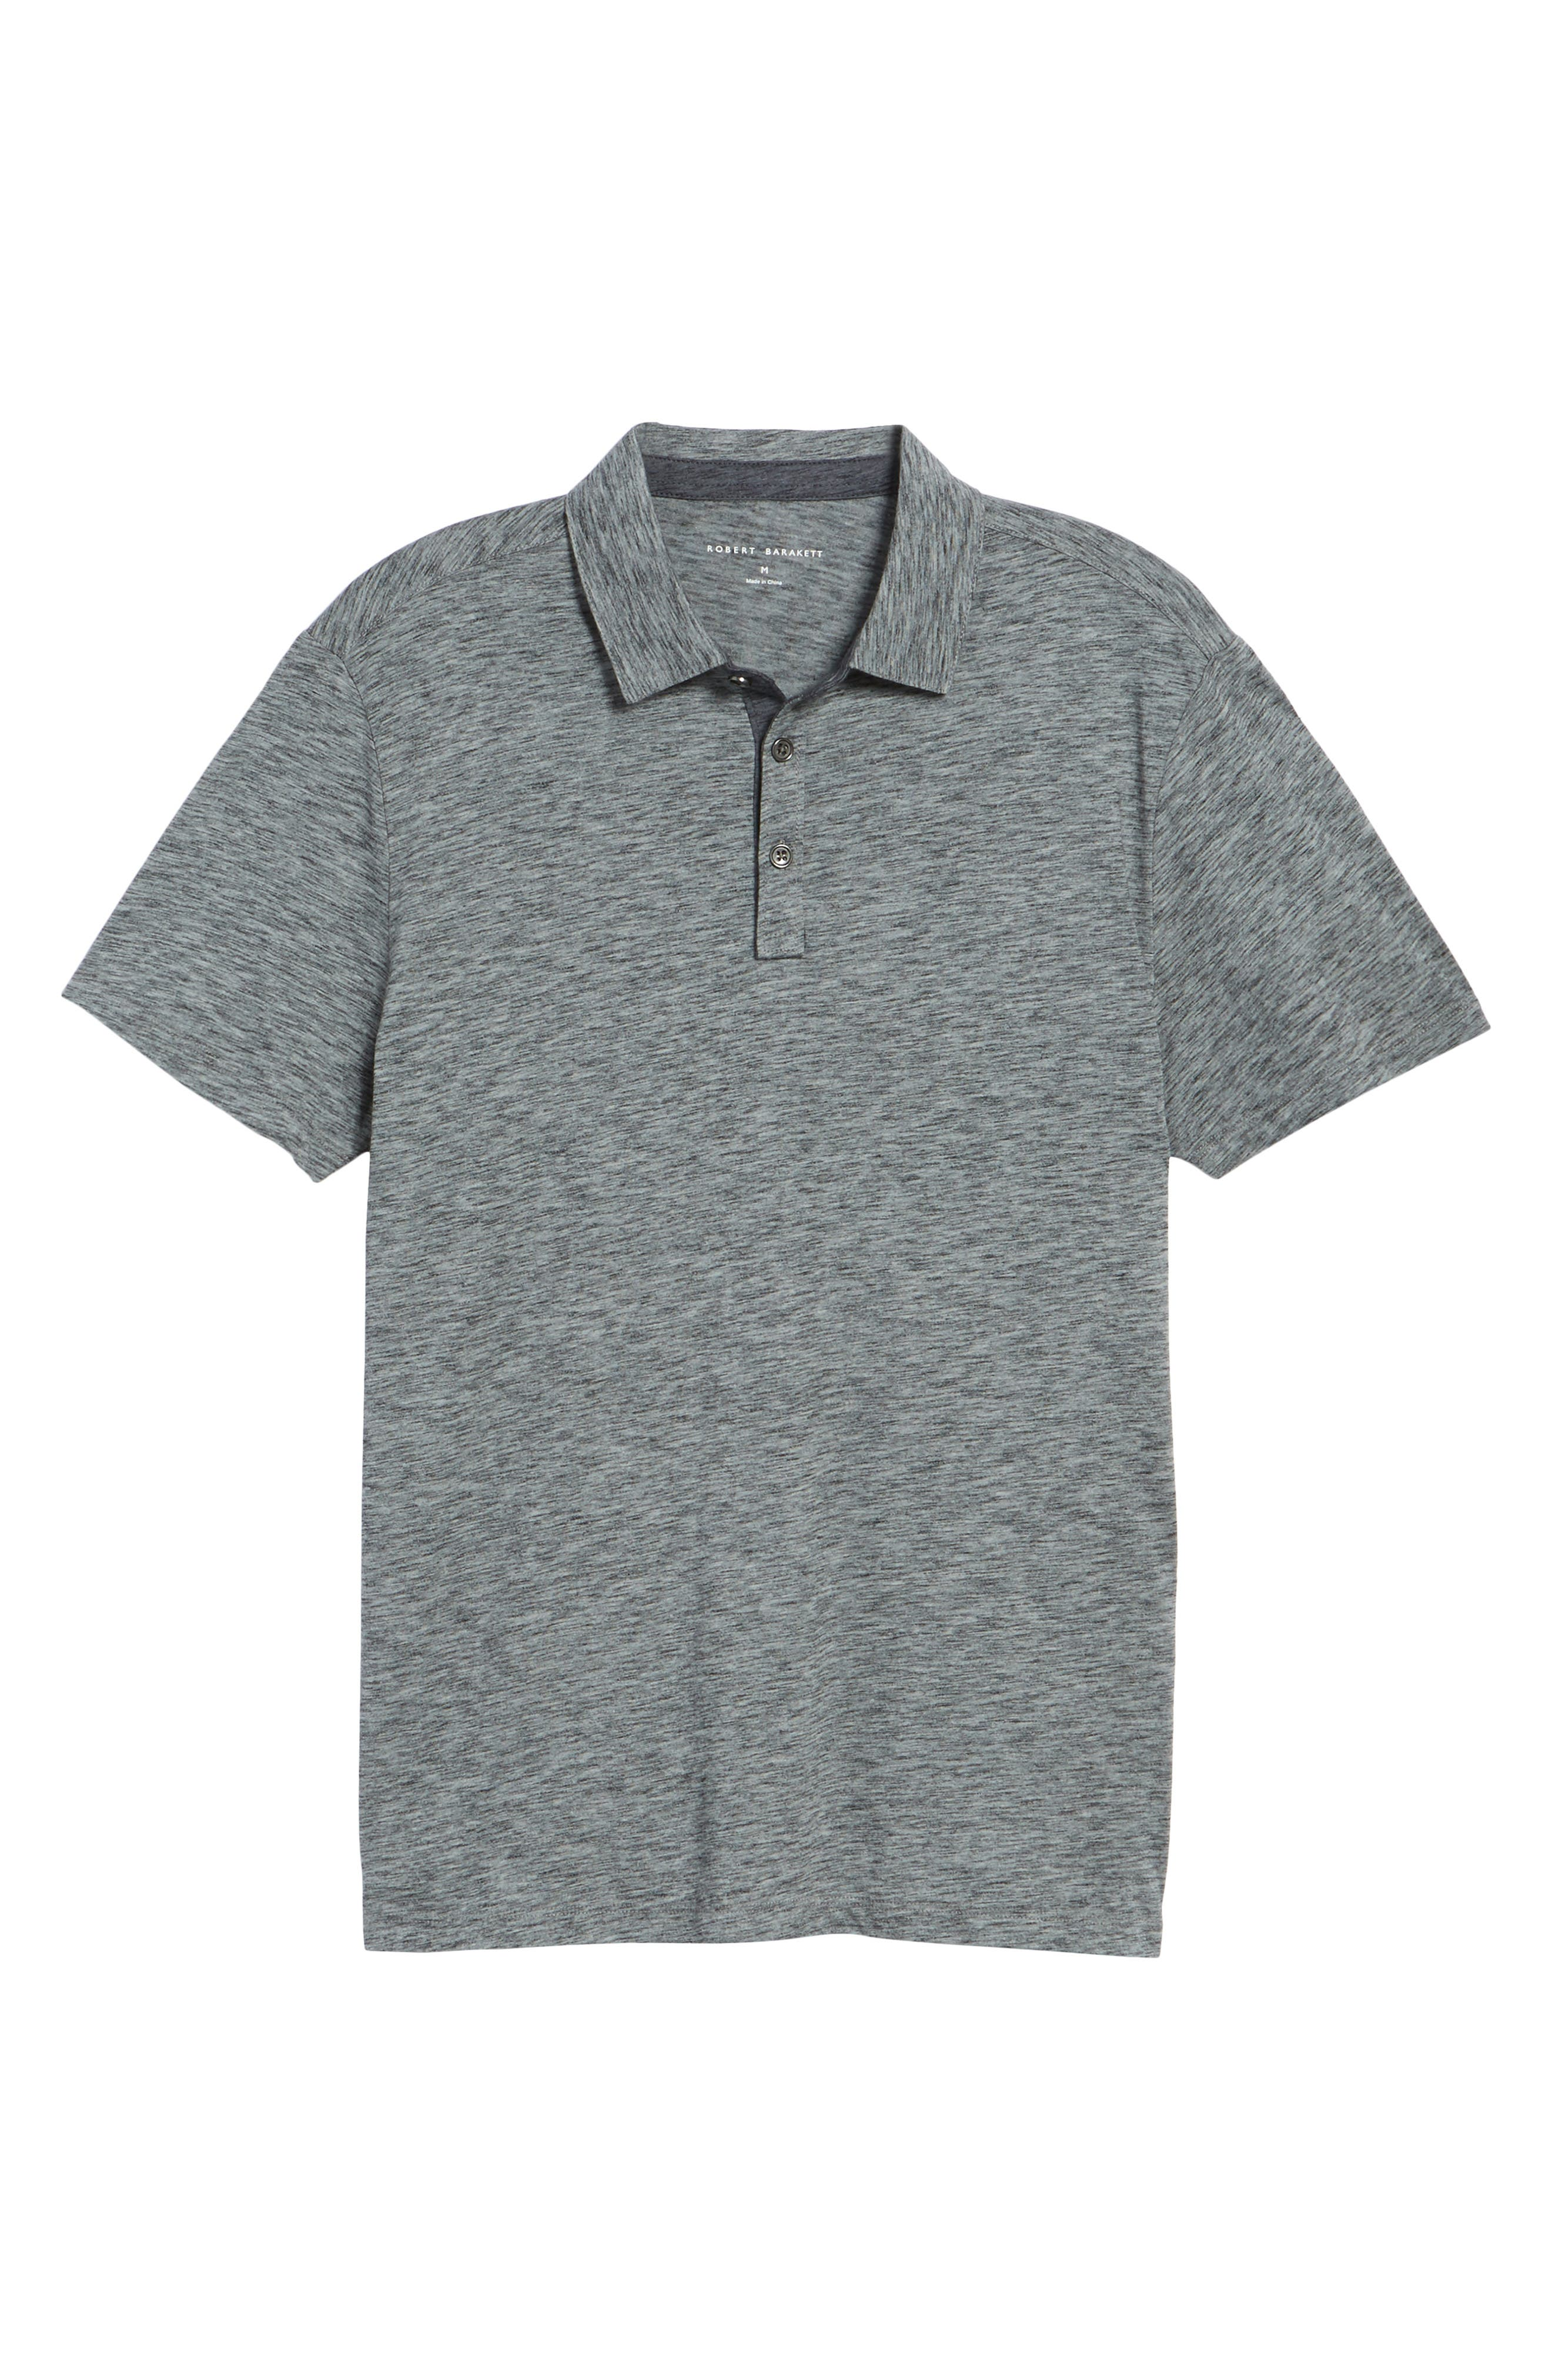 B-Stern Graphic T-Shirt,                             Alternate thumbnail 6, color,                             001